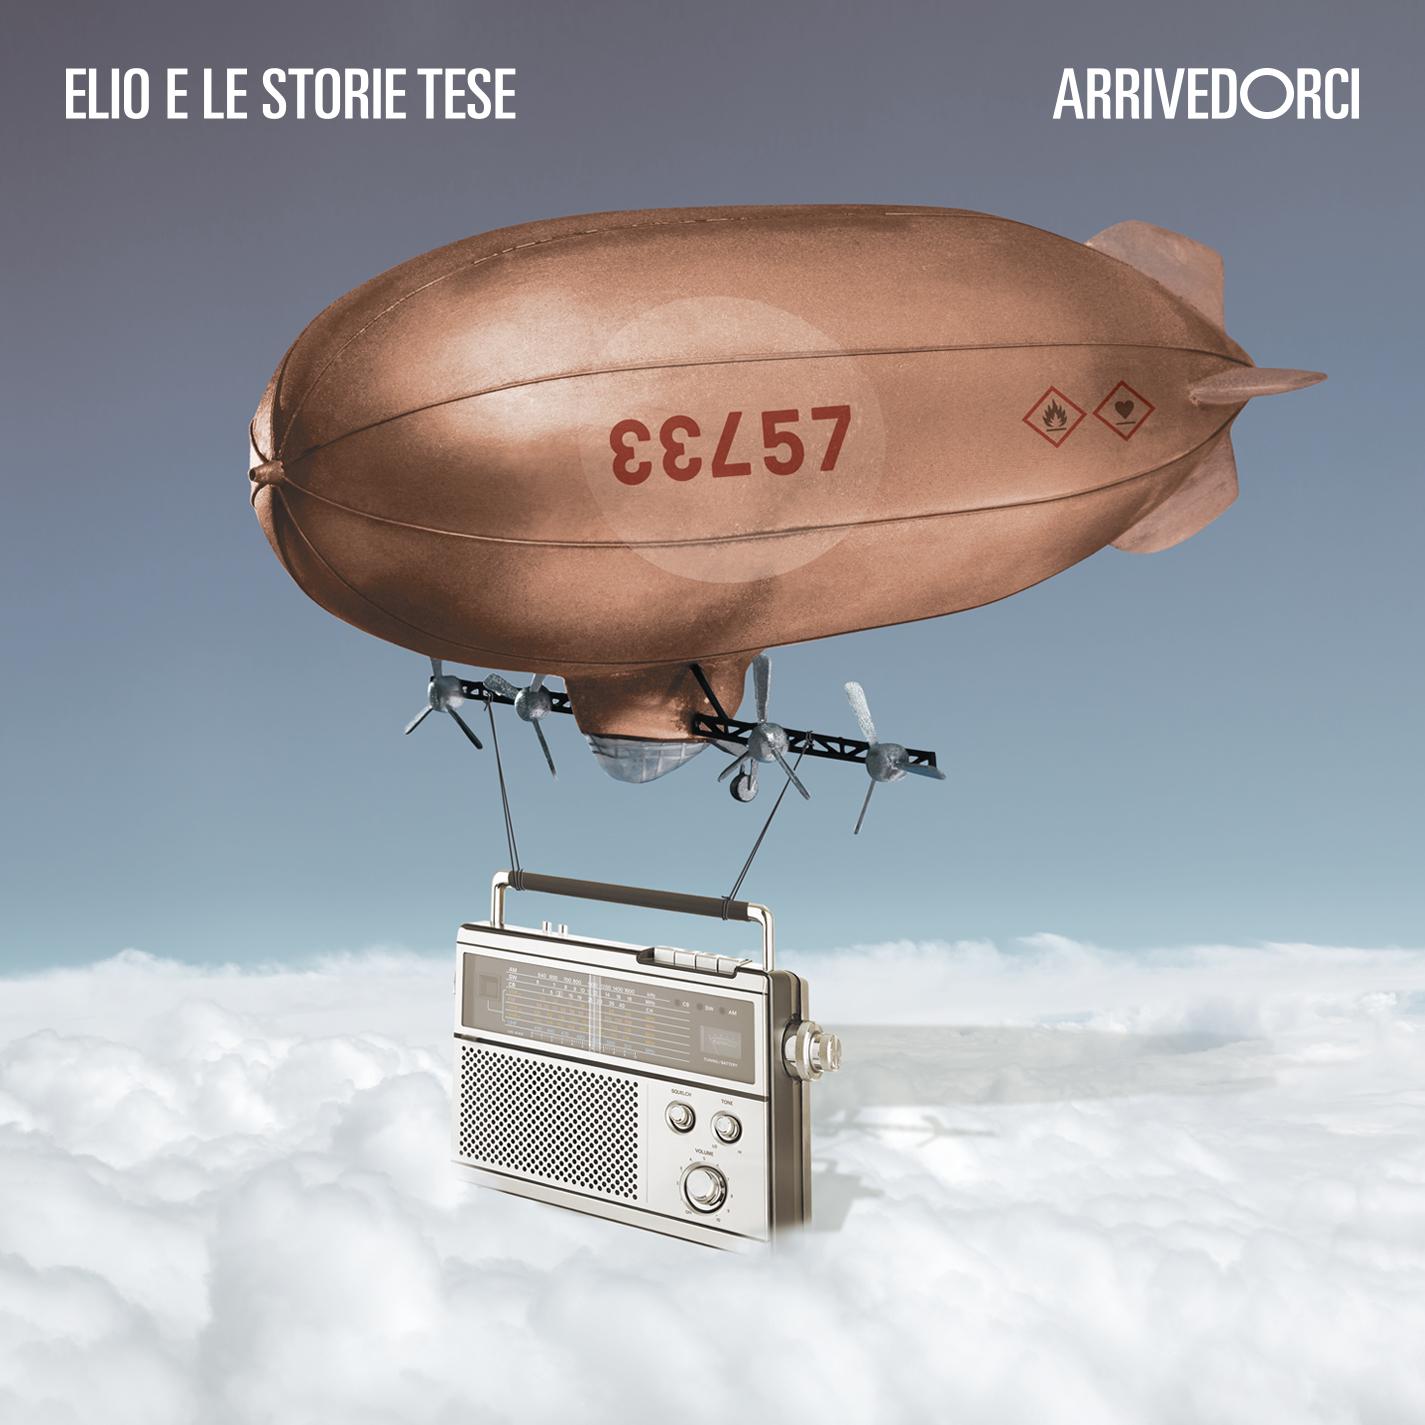 ELIO E LE STORIE TESE - ARRIVEDORCI (4 LP 180 GR. + 45 GIRI) (LP)